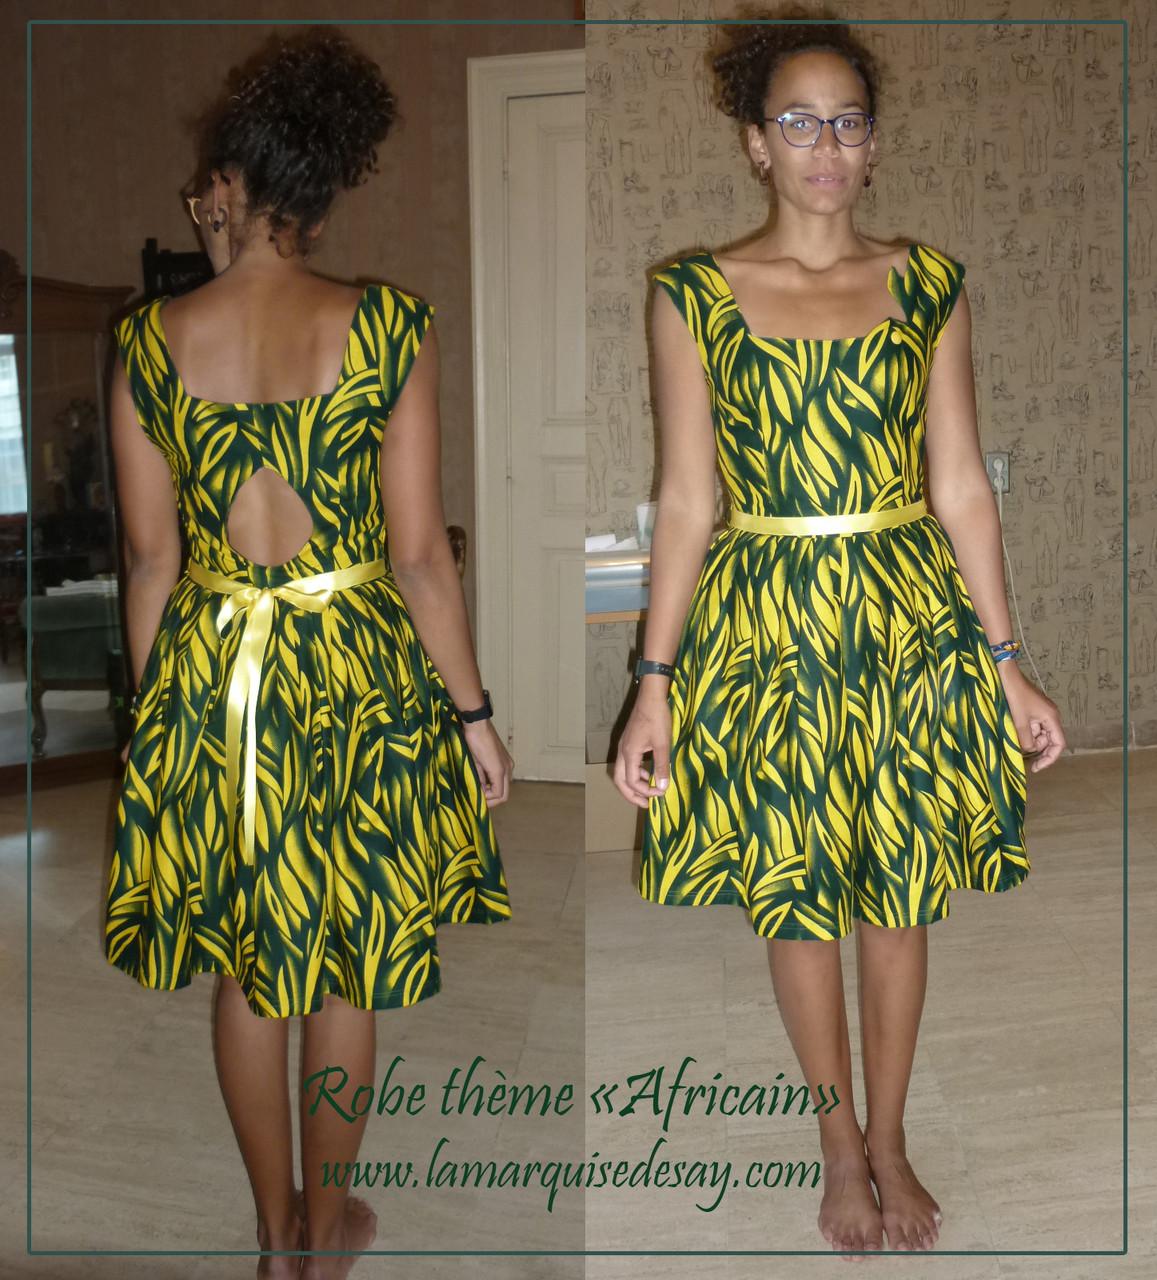 Robe thème AFRICAIN